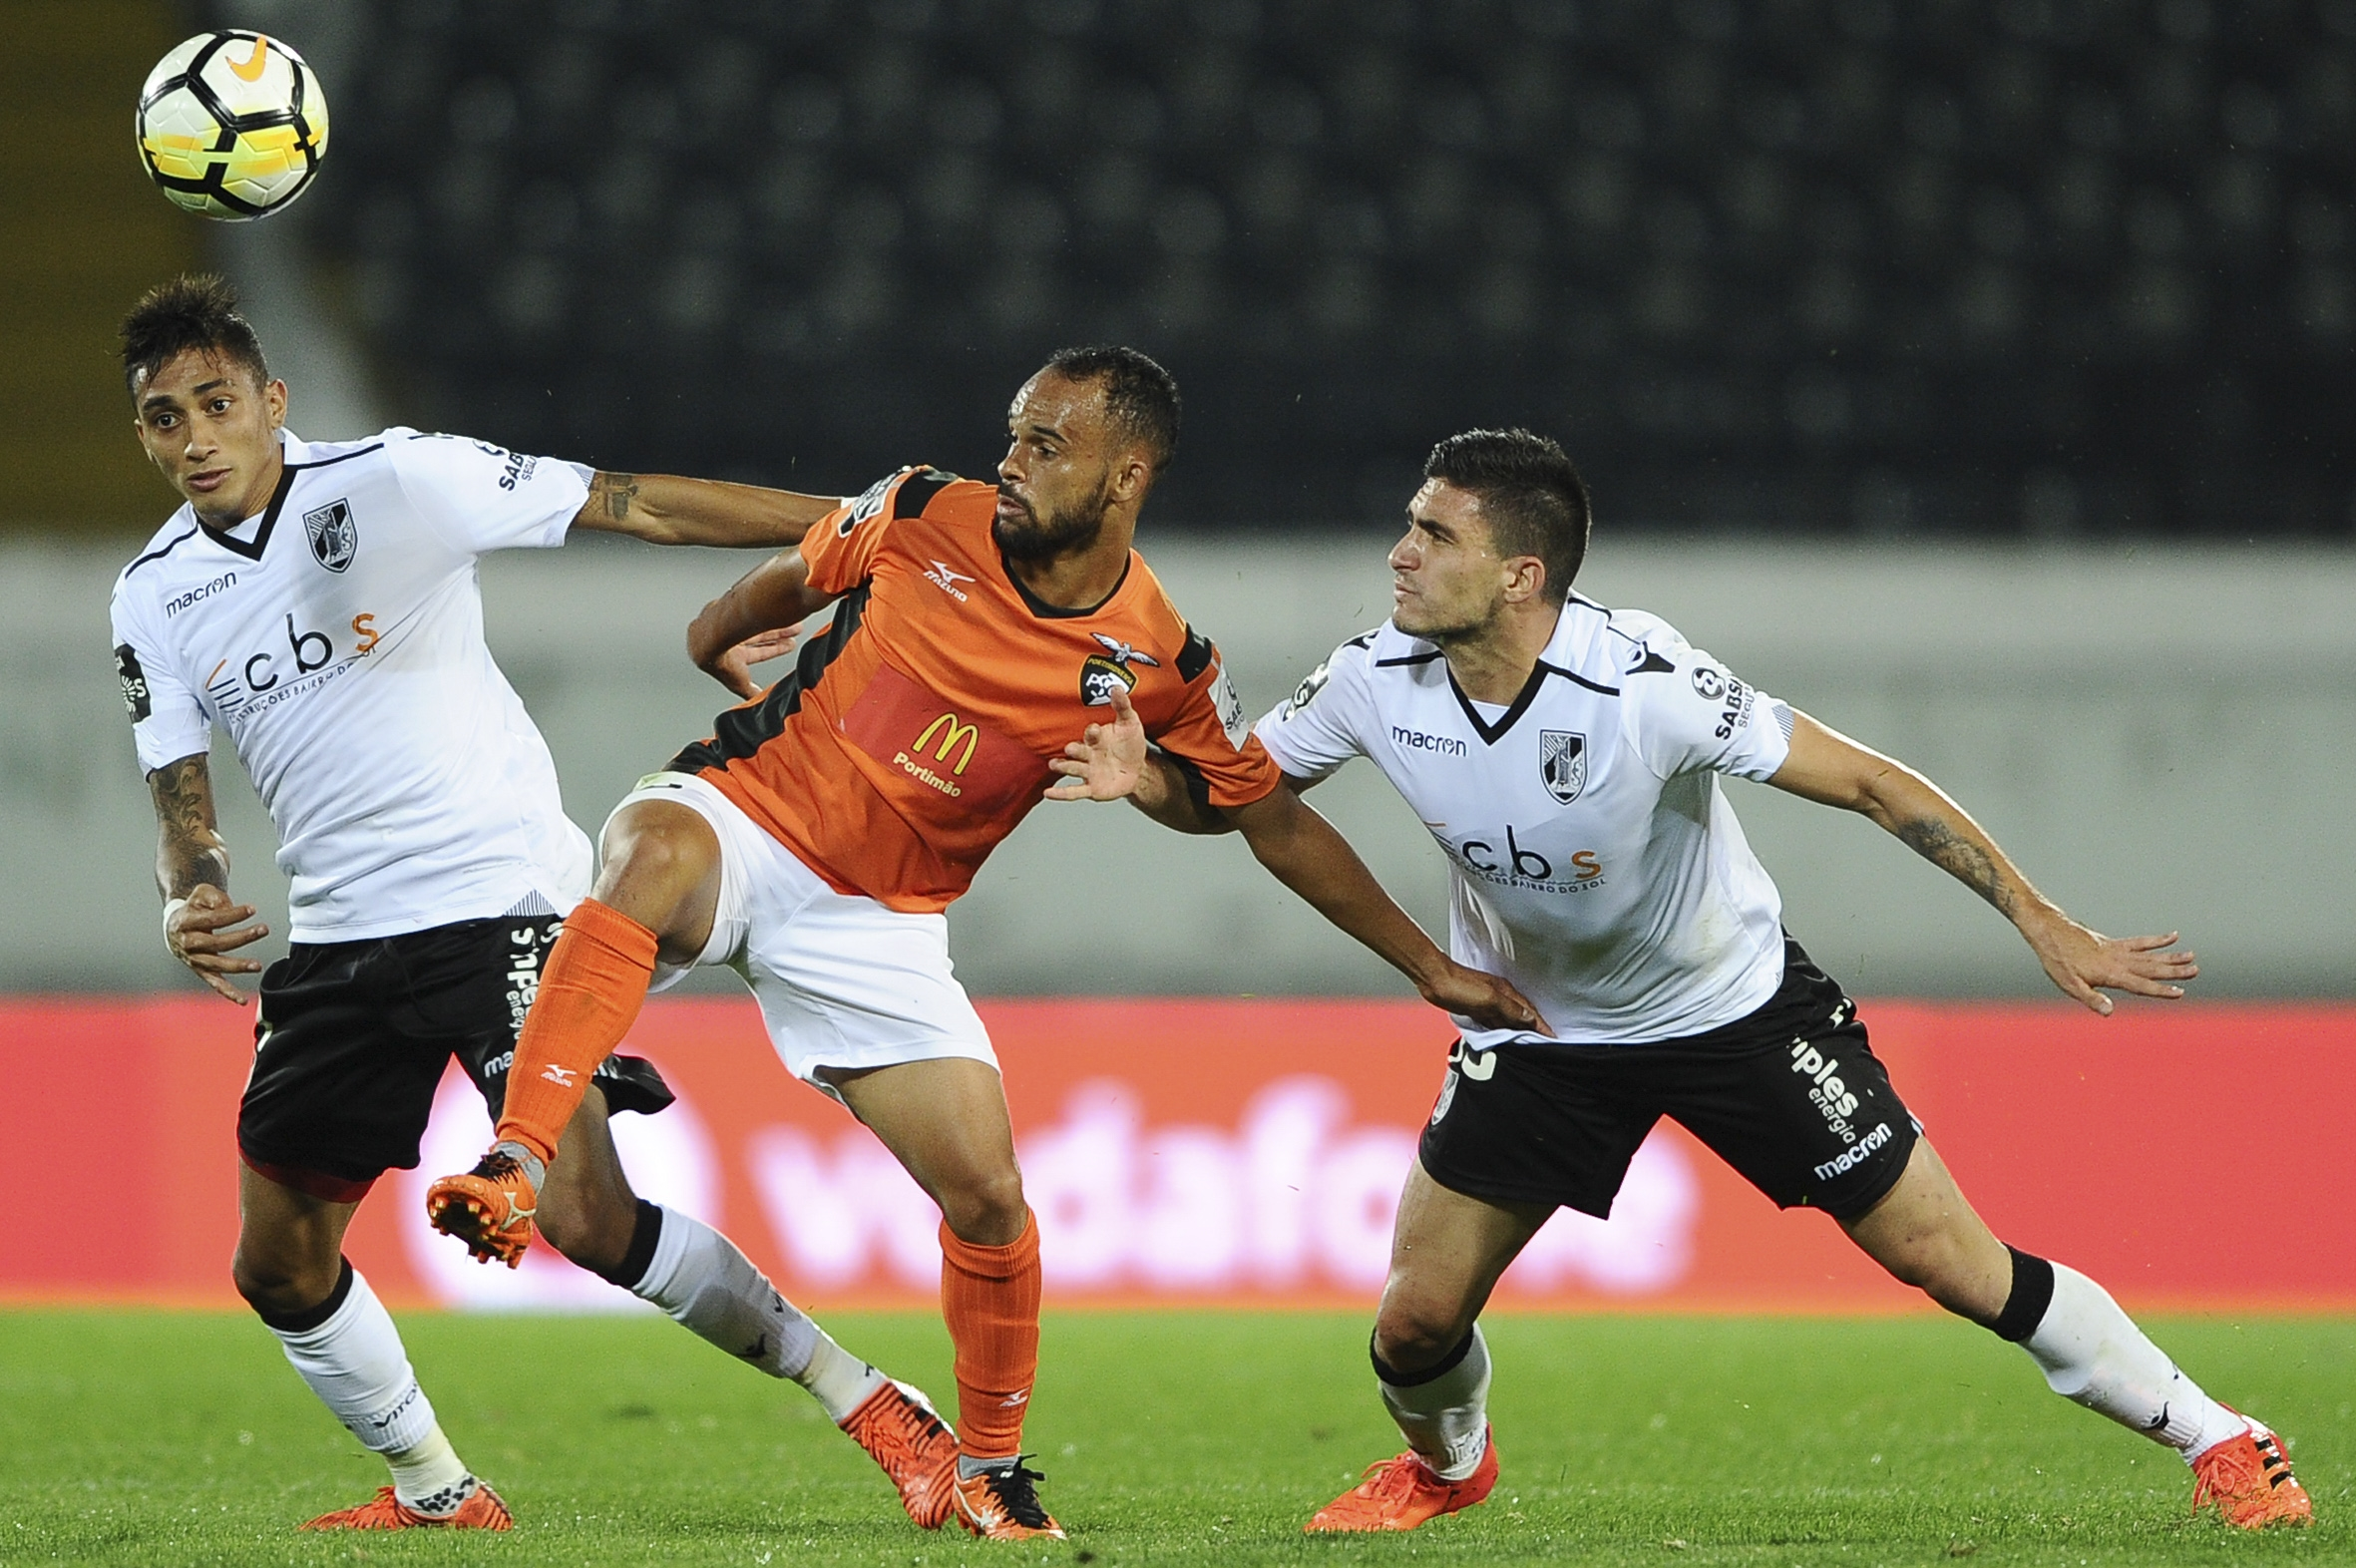 Vítor Oliveira diz que Portimonense vai defrontar o FC Porto